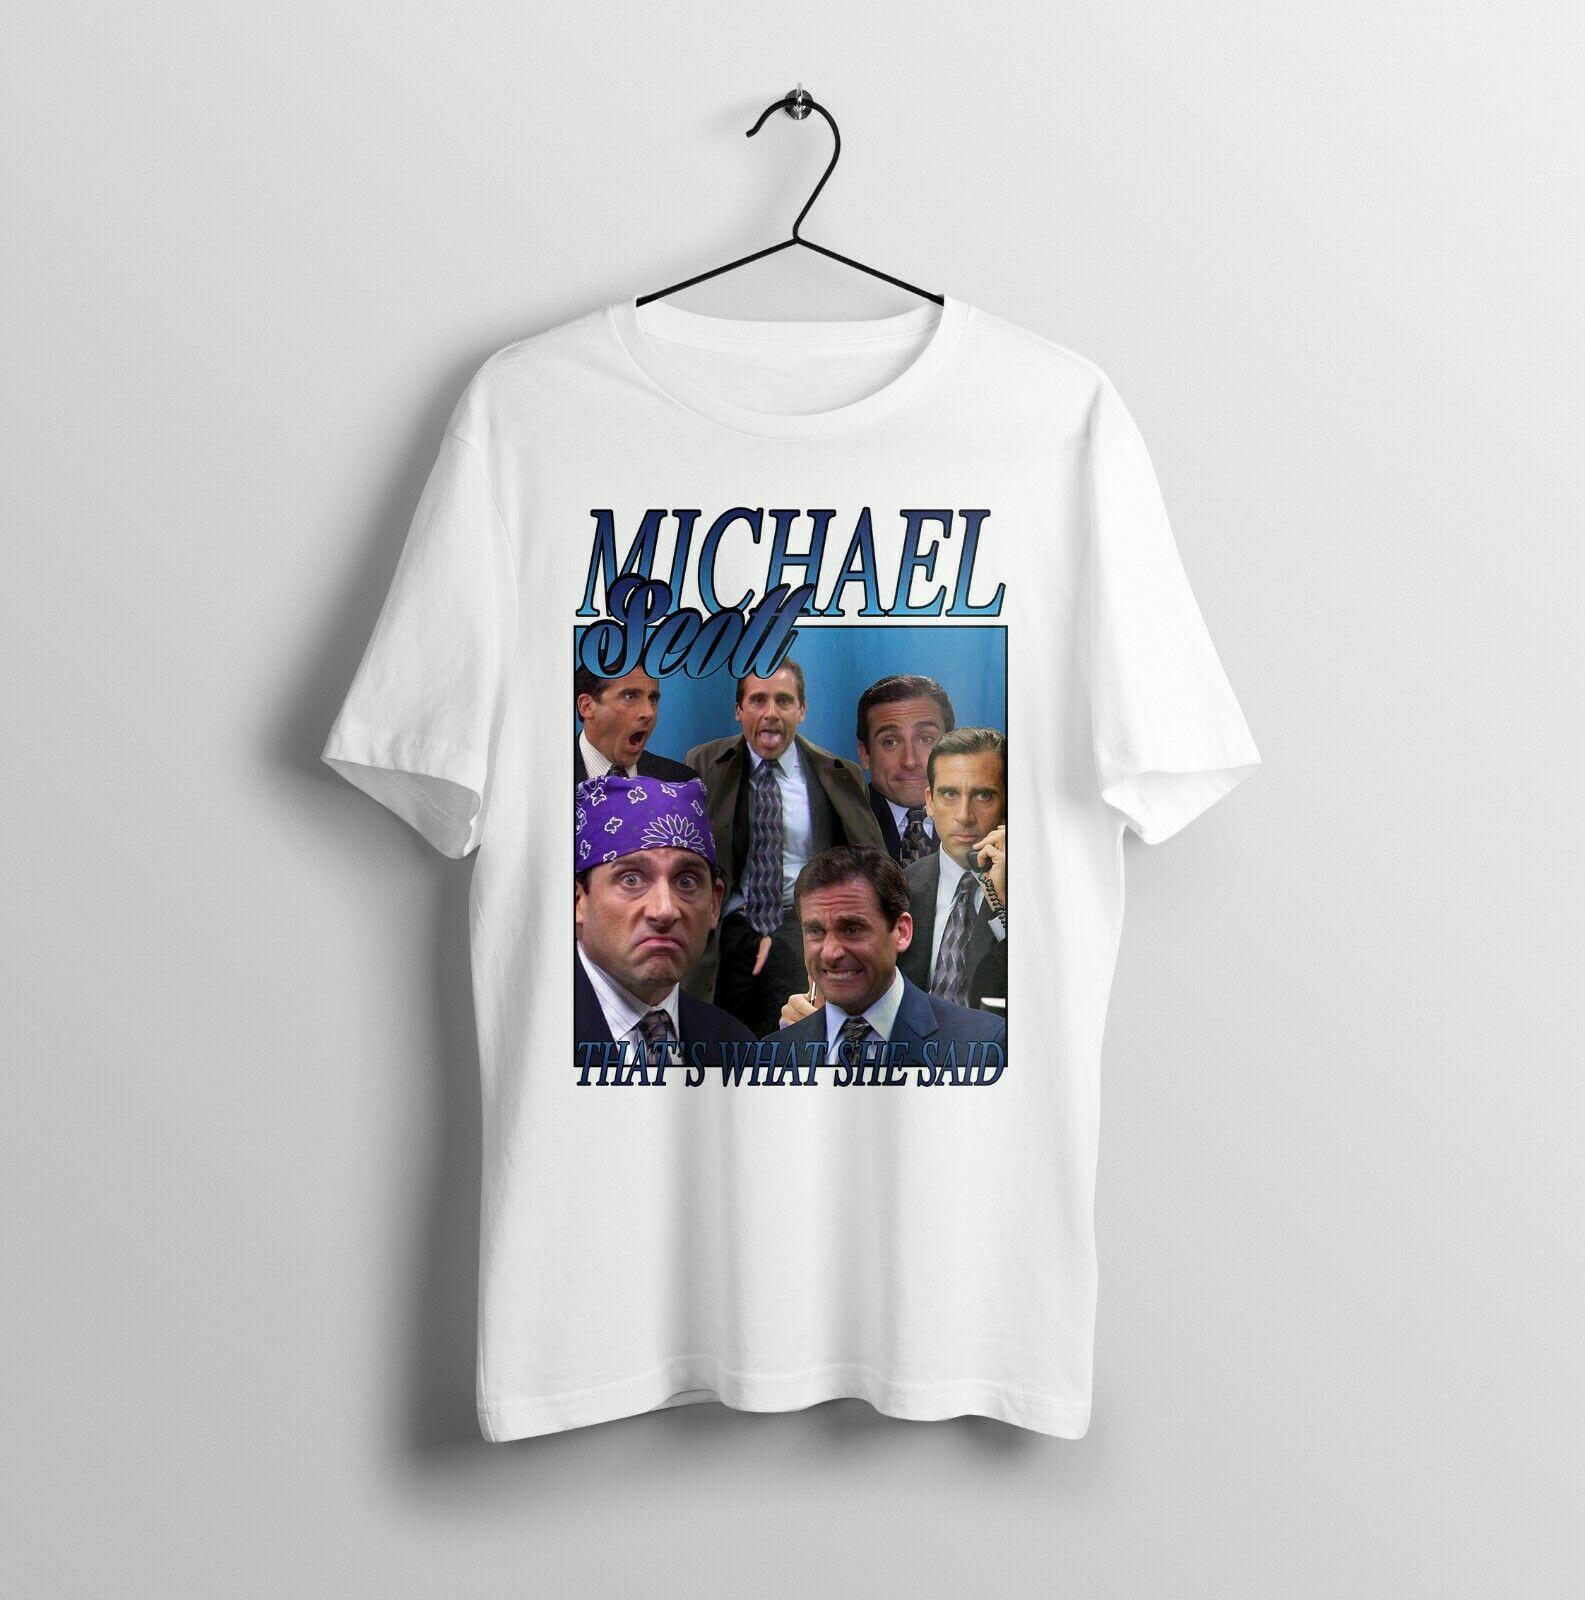 Michael Scott, la Oficina, divertido Vintage homenaje-Mens Unisex camiseta adulto verano Streewear tamaño S-3Xl